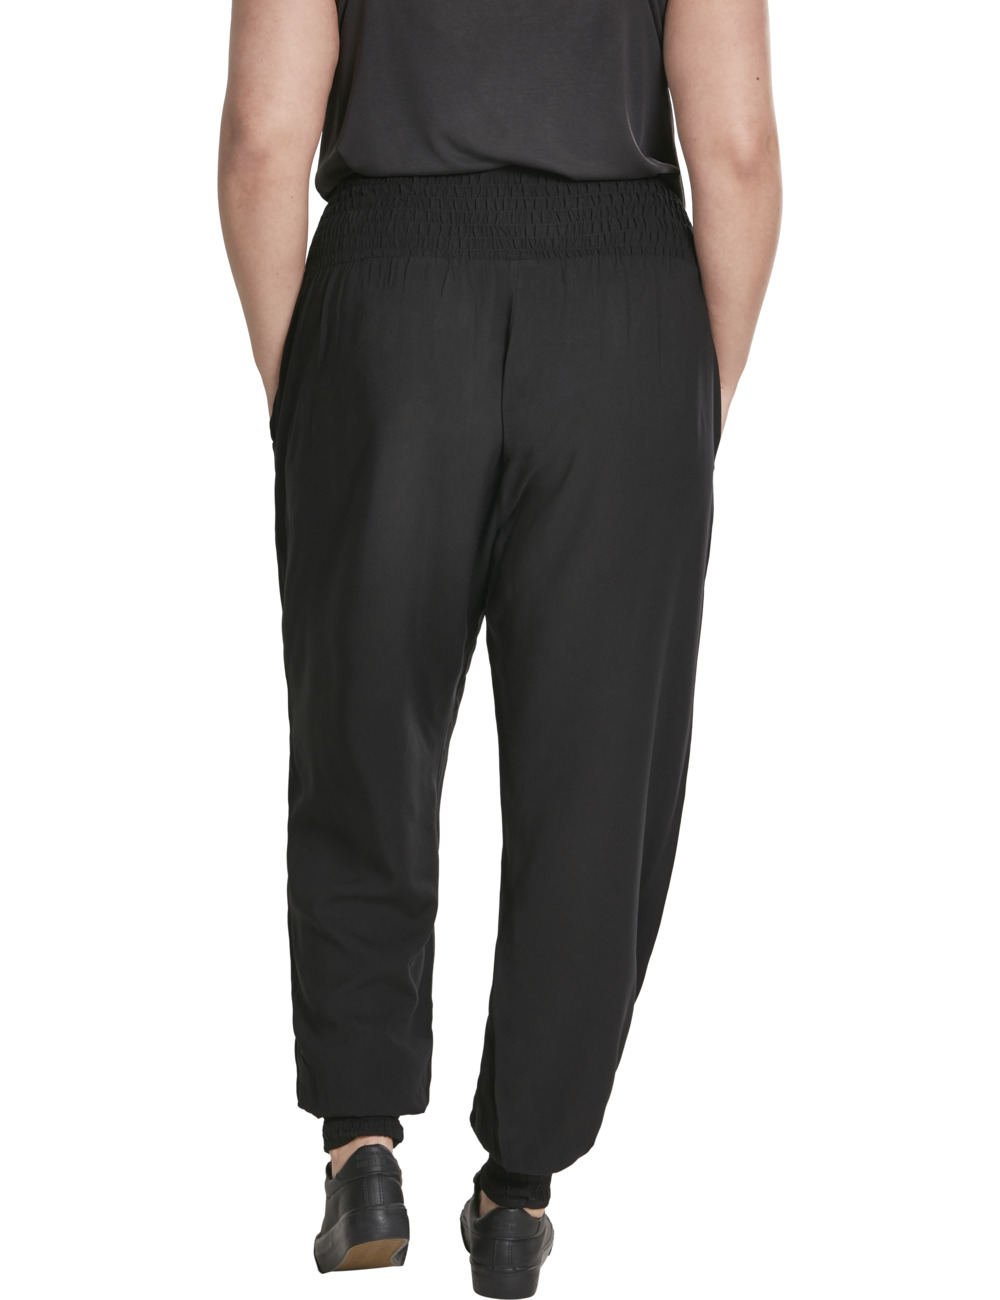 urban-classics-ladies-sarong-pants